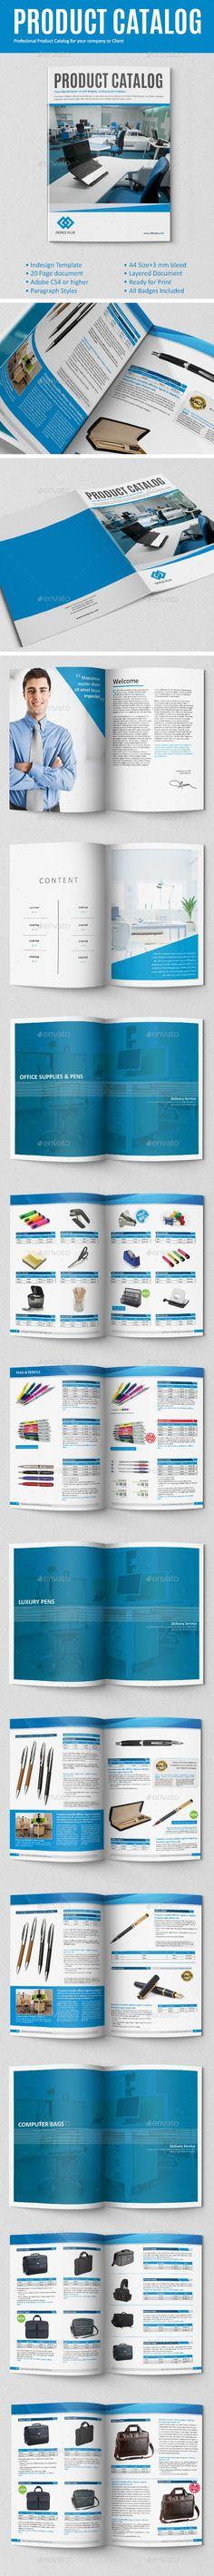 Module Product Catalog Print templates, Brochures and Brochure - product brochures